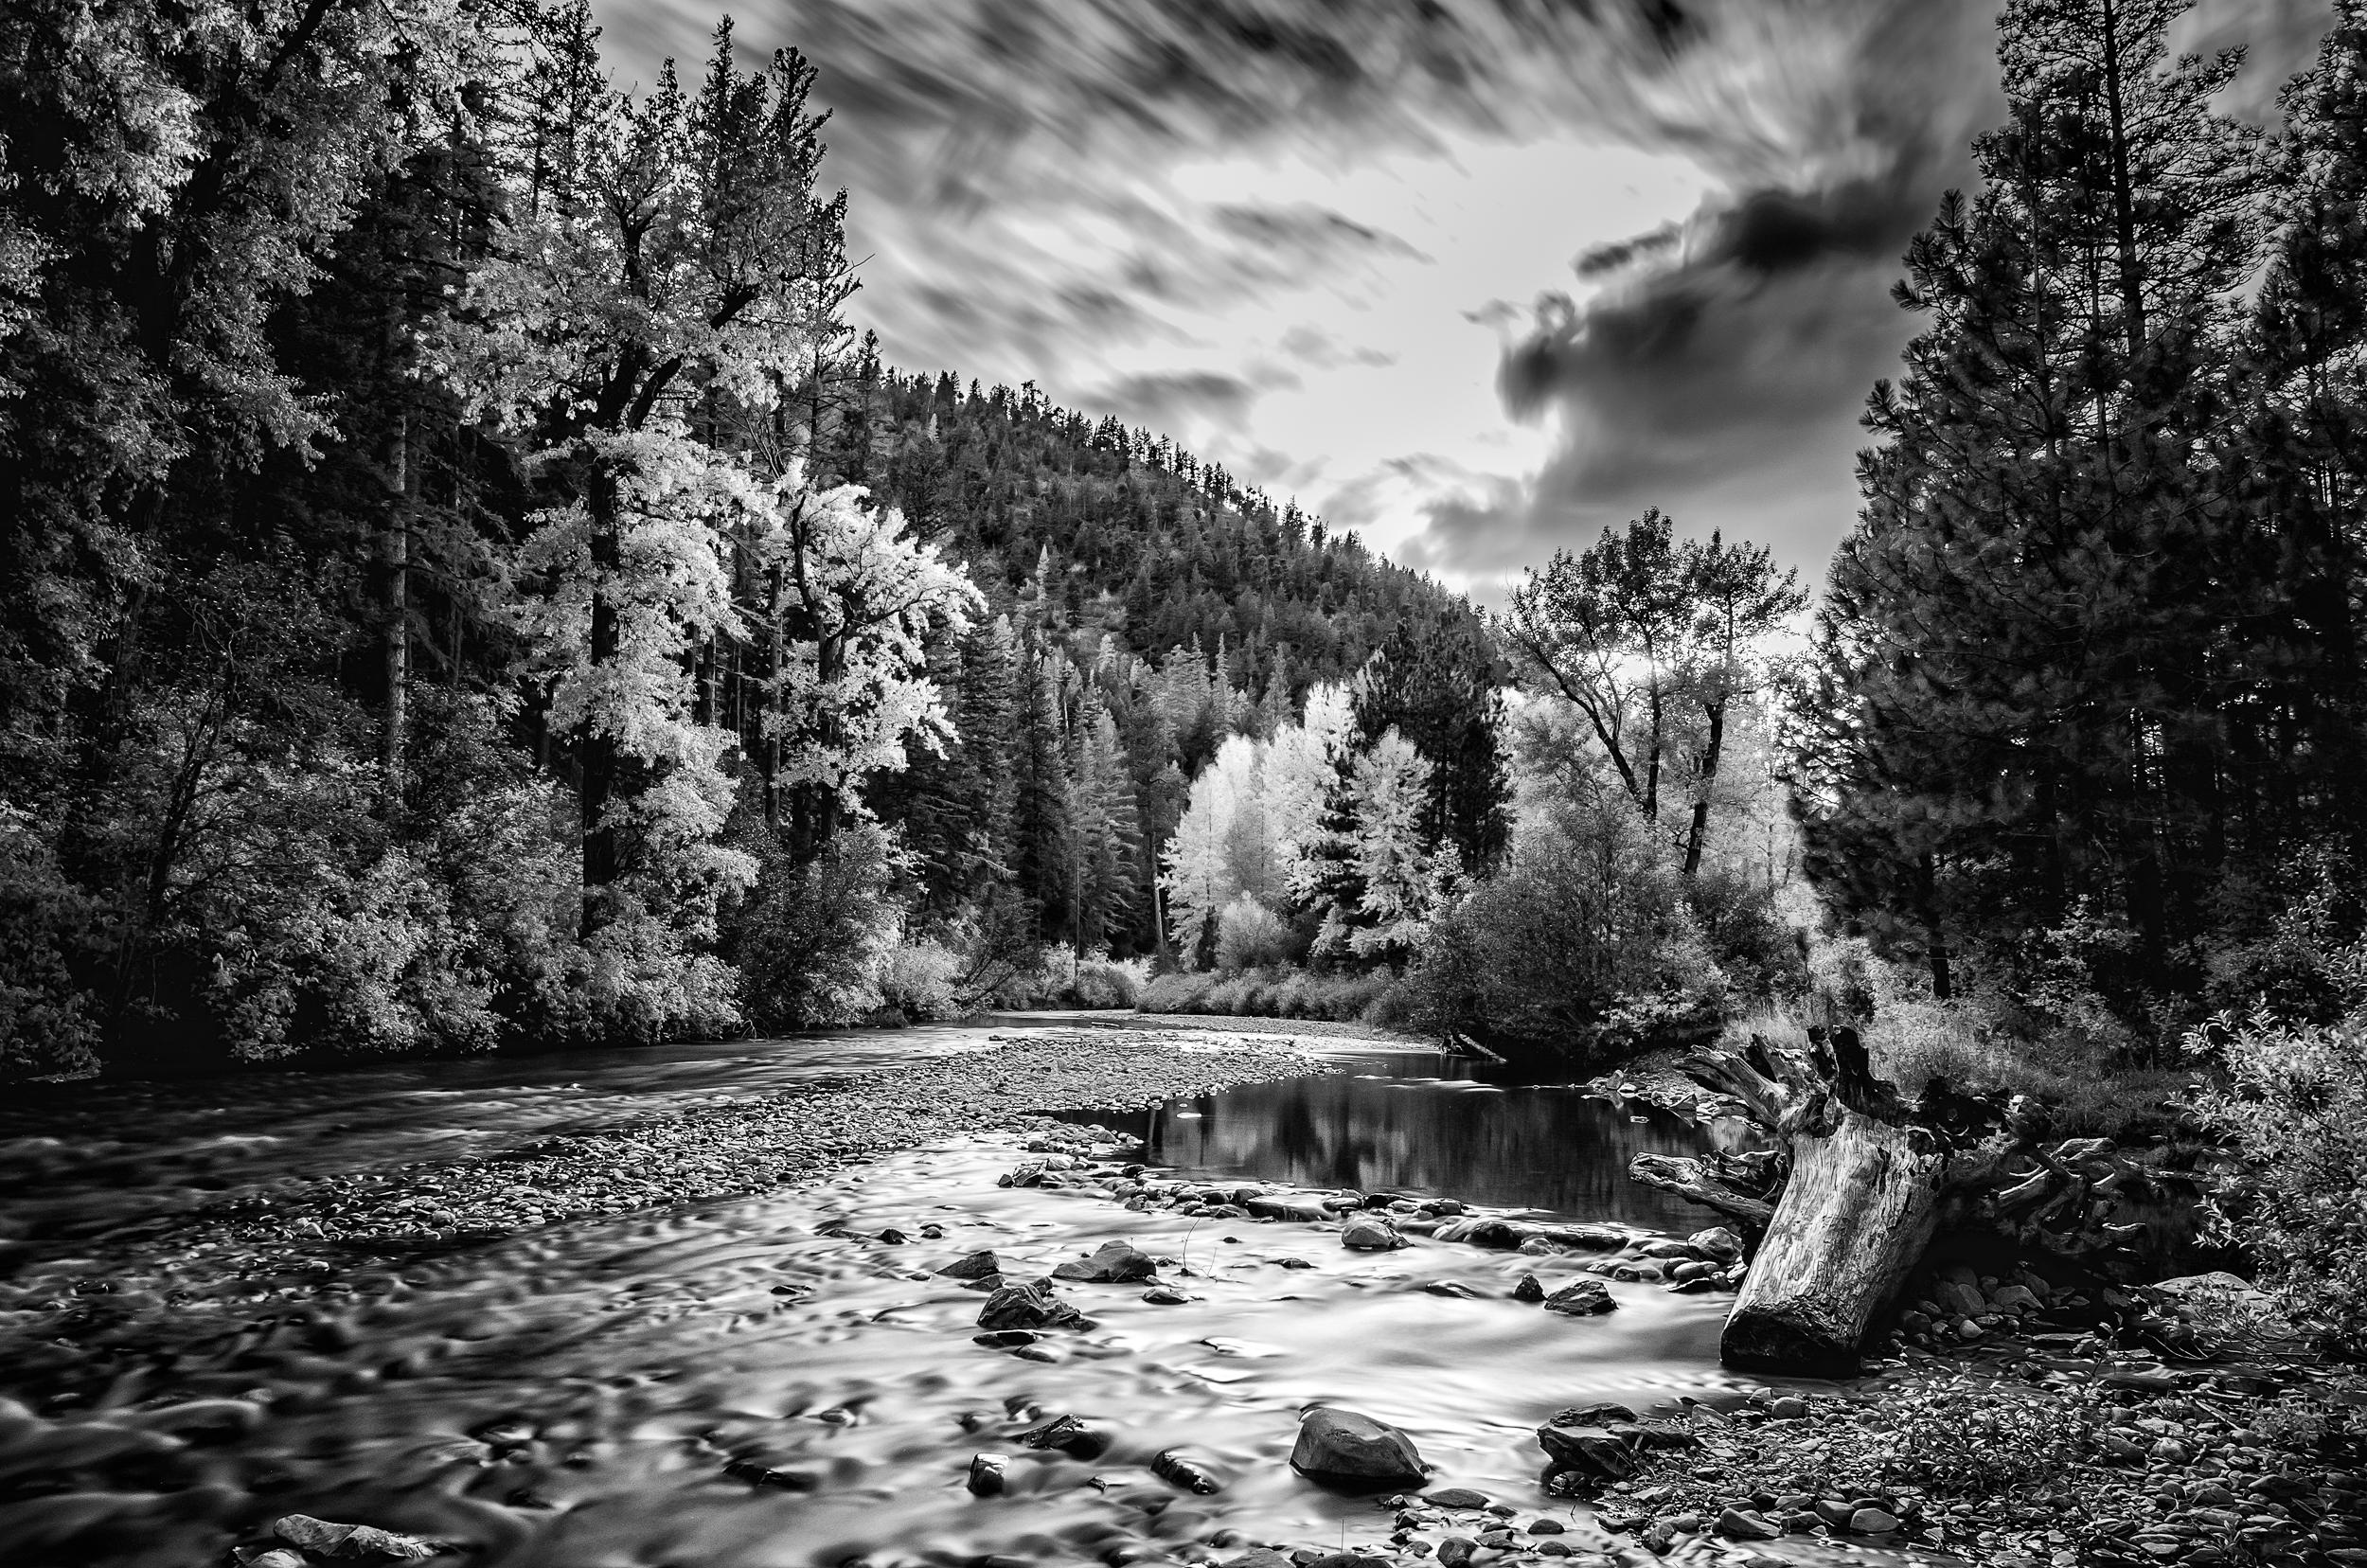 Lolo Creek, Montana